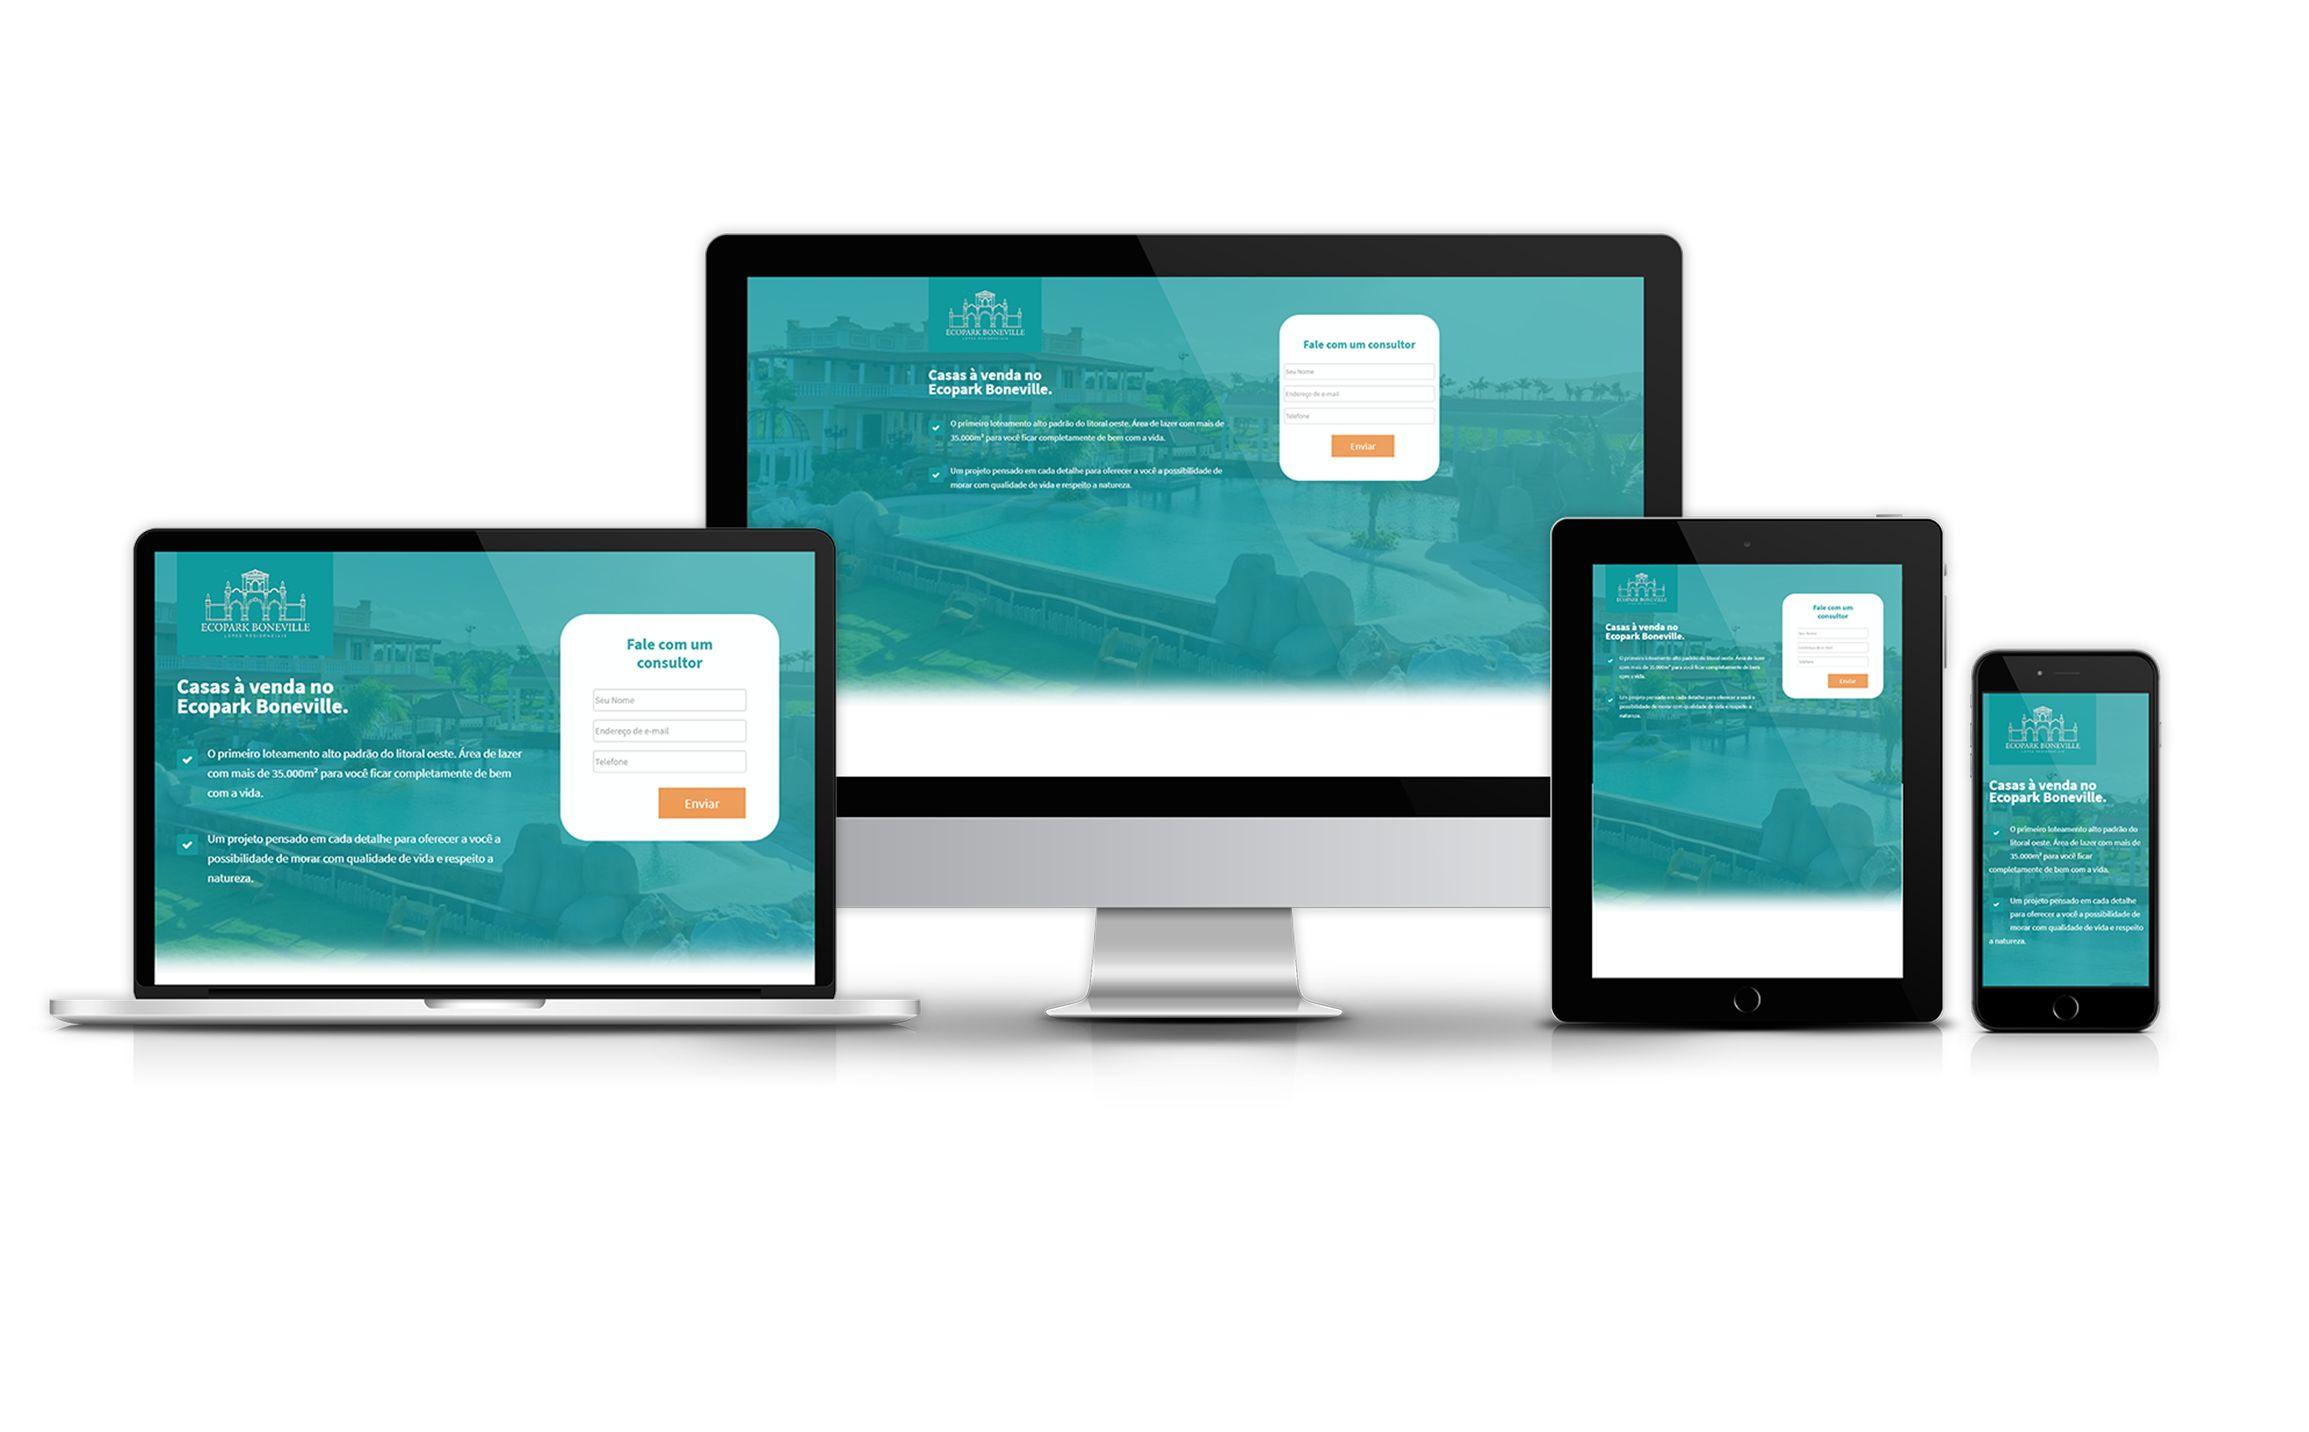 landing-page-ecopark-boneville-alpha-mil-imoveis-portfolio-agencia-diretriz-digital-marketing2